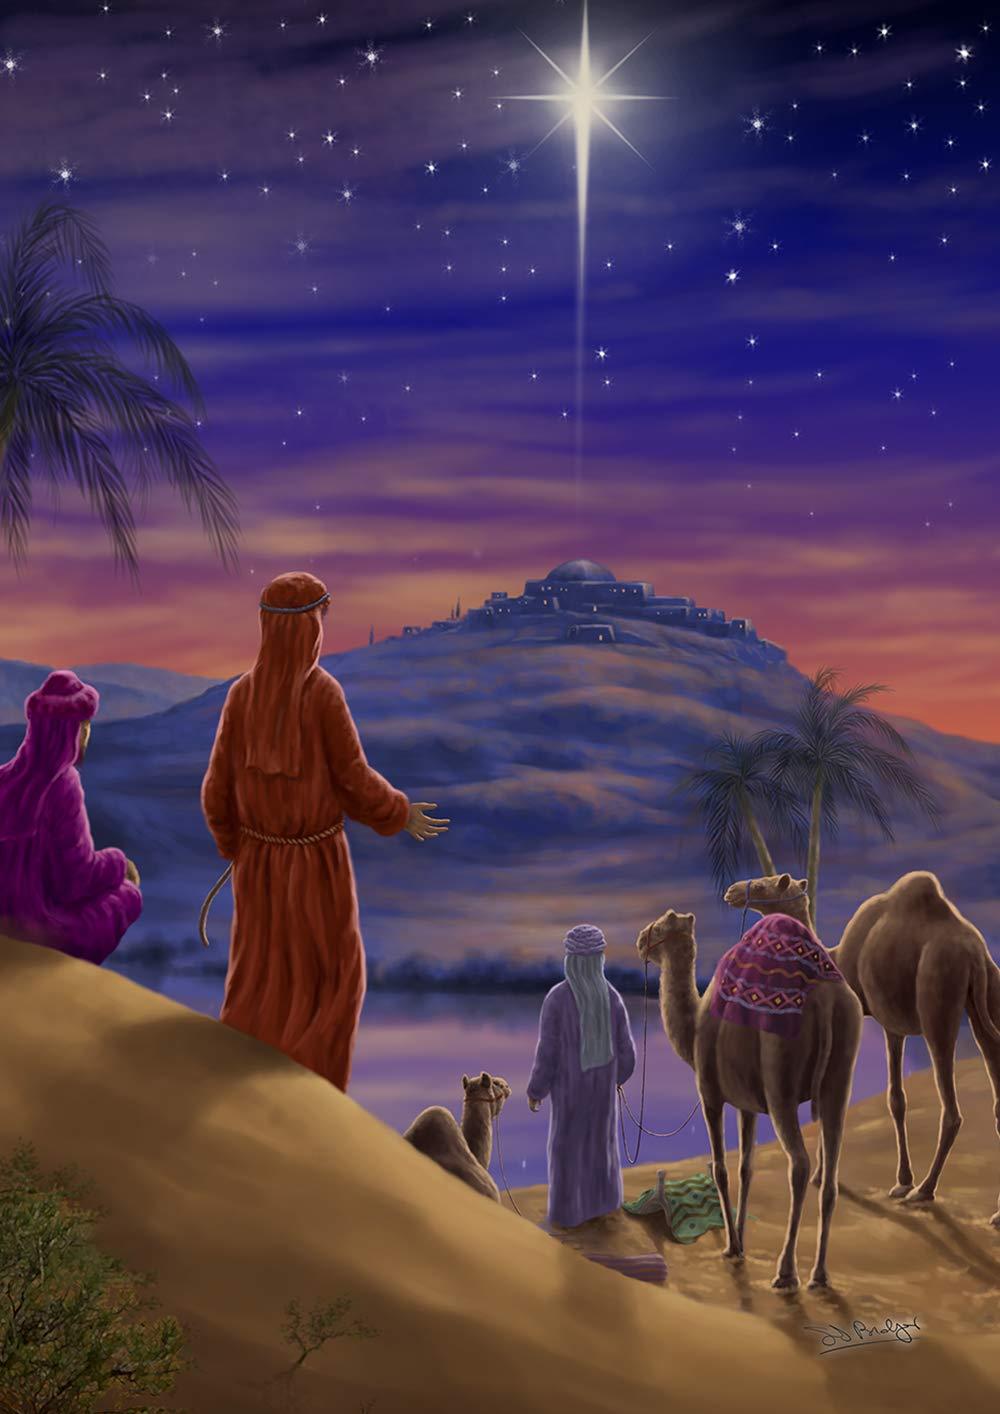 Toland Home Garden 1112271 Star Of Bethlehem Garden Flag 12 5 X 18 Inch Winter Christmas Nativity Multi Buy Online At Best Price In Uae Amazon Ae